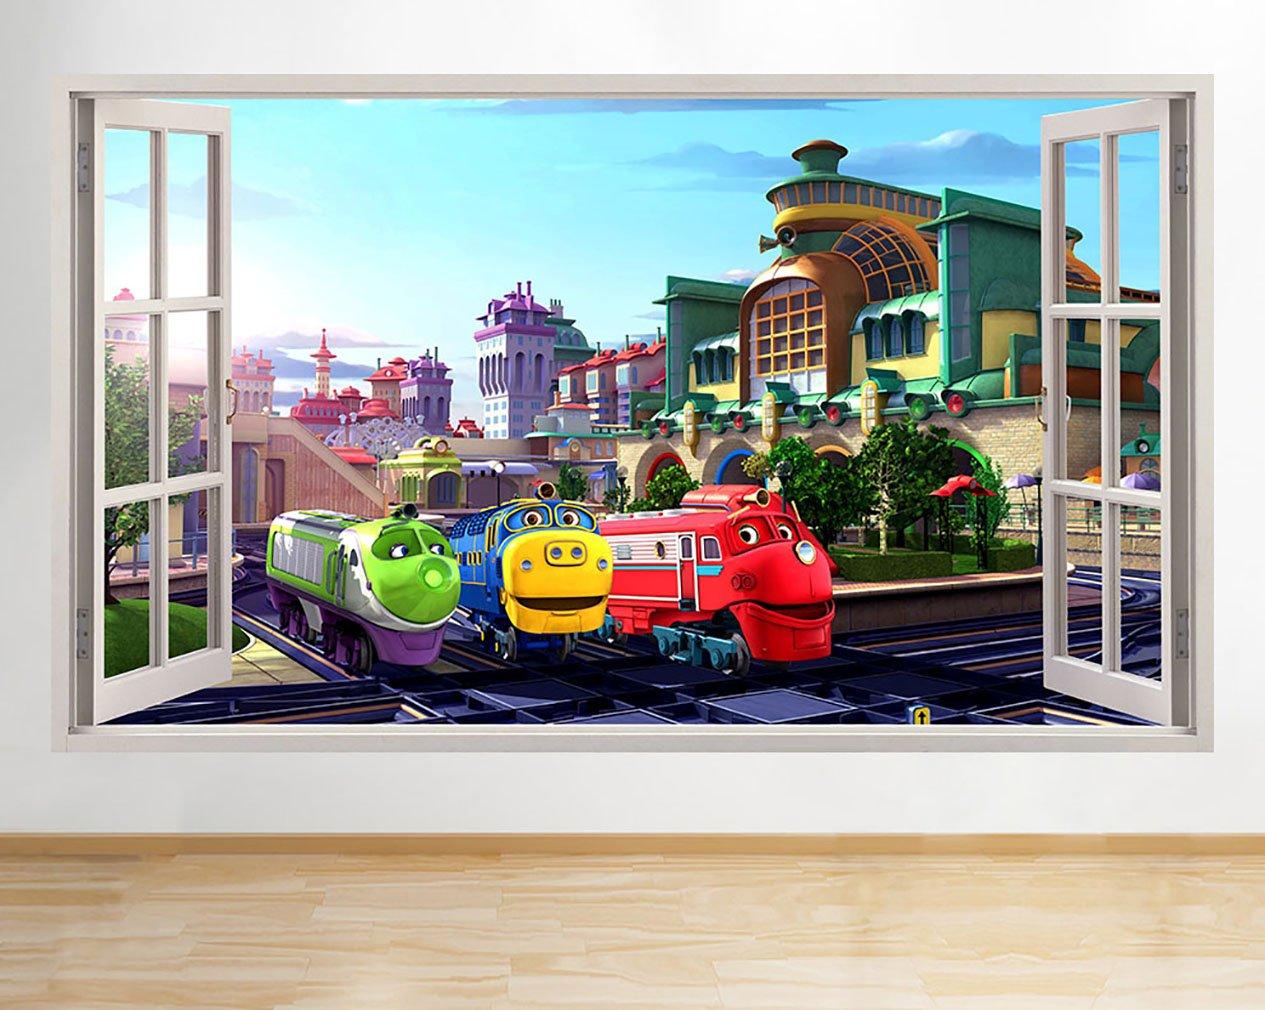 M003 Chuggington Trains Nursery Kid Window Wall Decal 3d Art